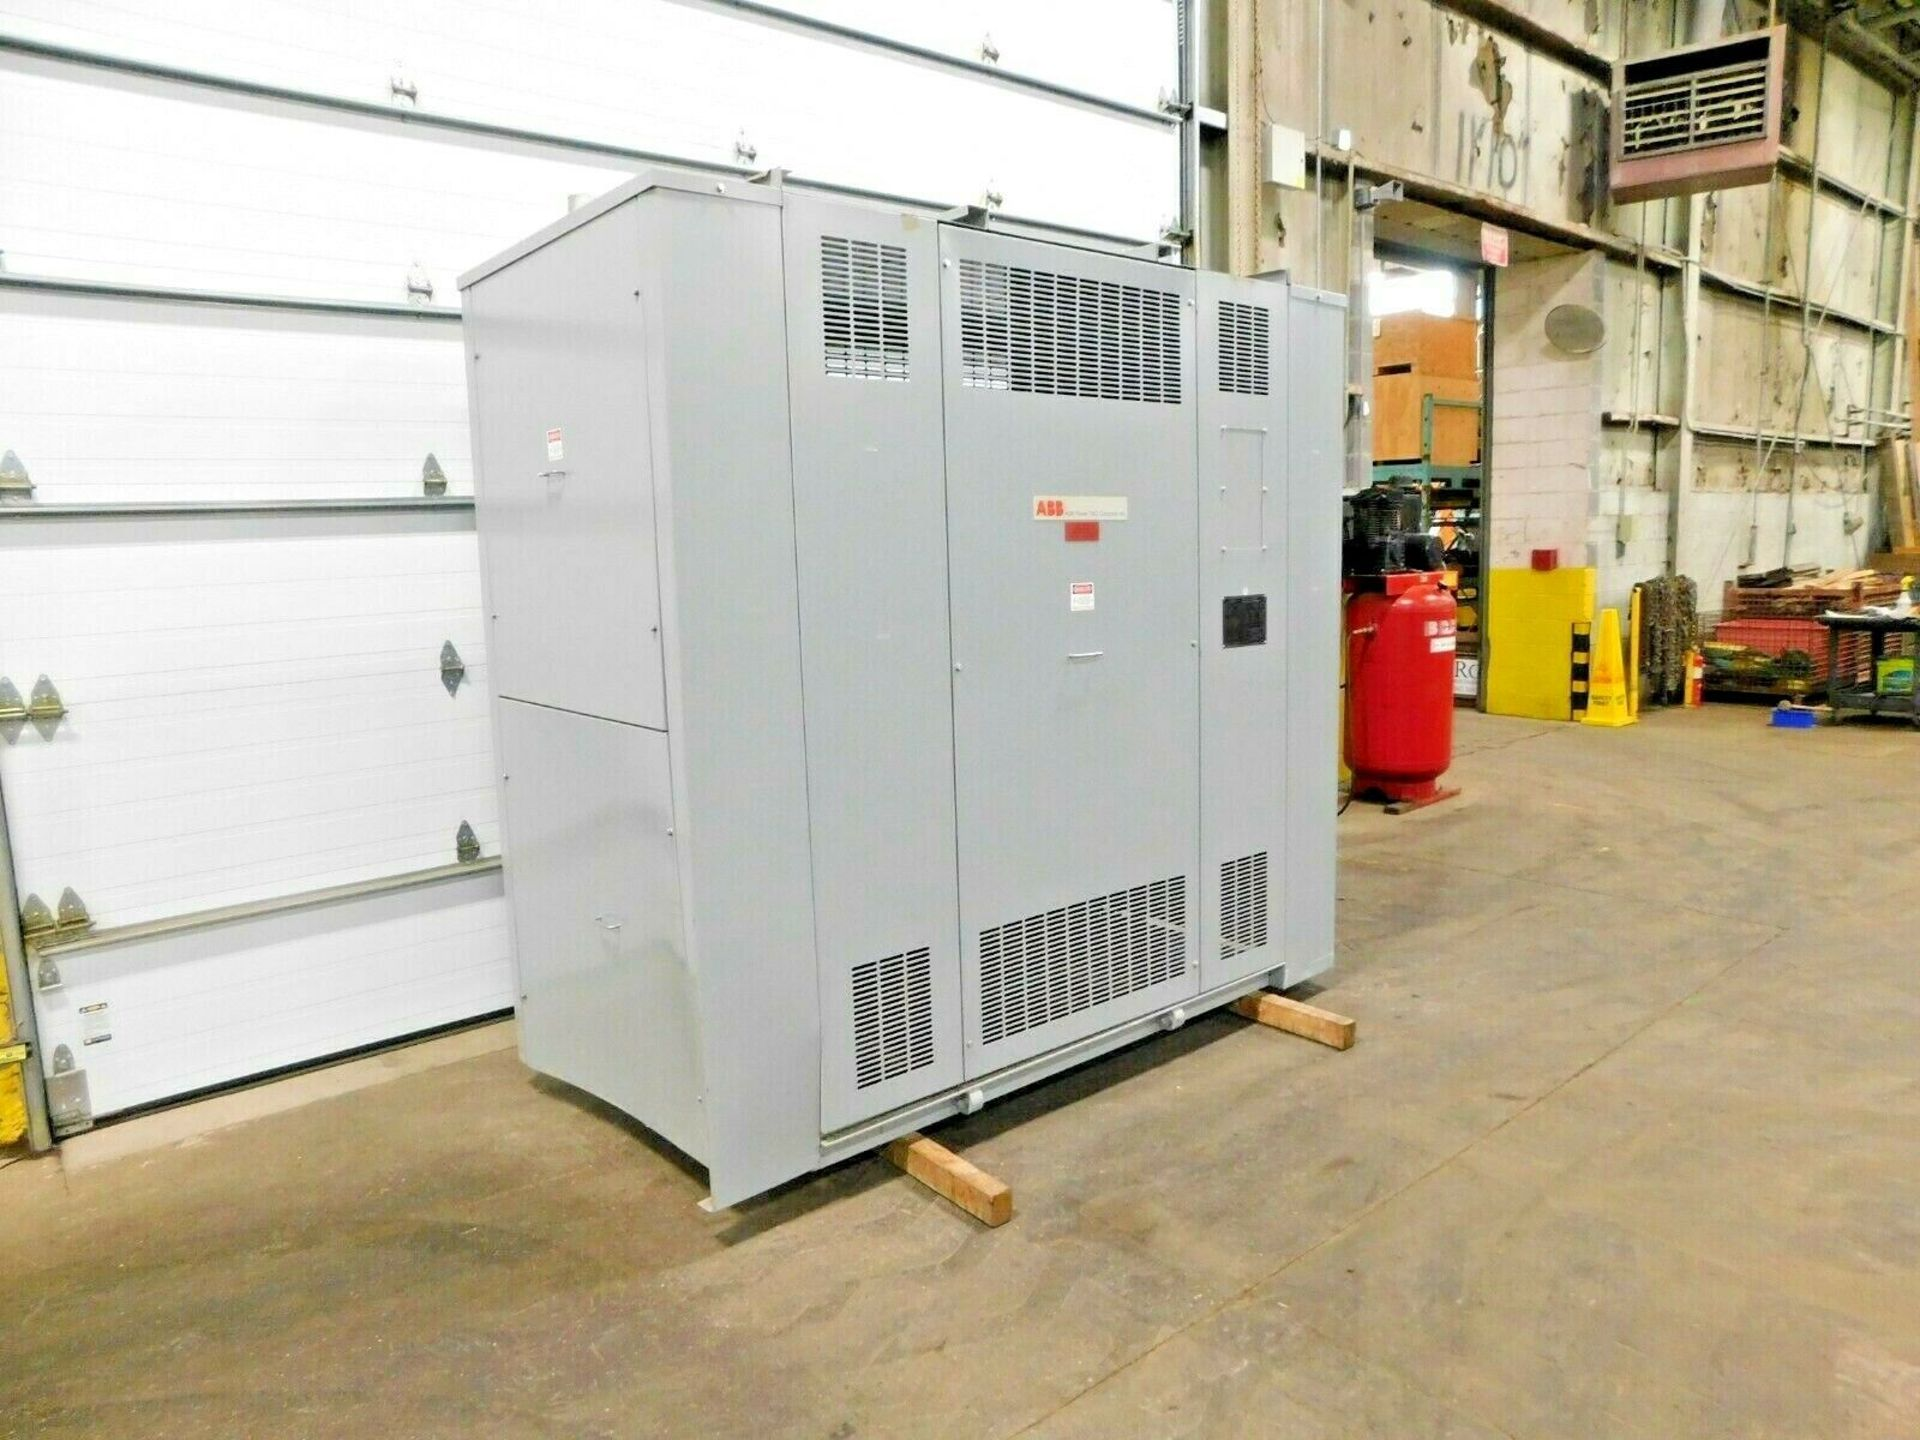 ABB 500 KVA Dry Type Transformer. 3 Ph. 4160 HV. 480 LV. 60 Hz. - Image 2 of 5